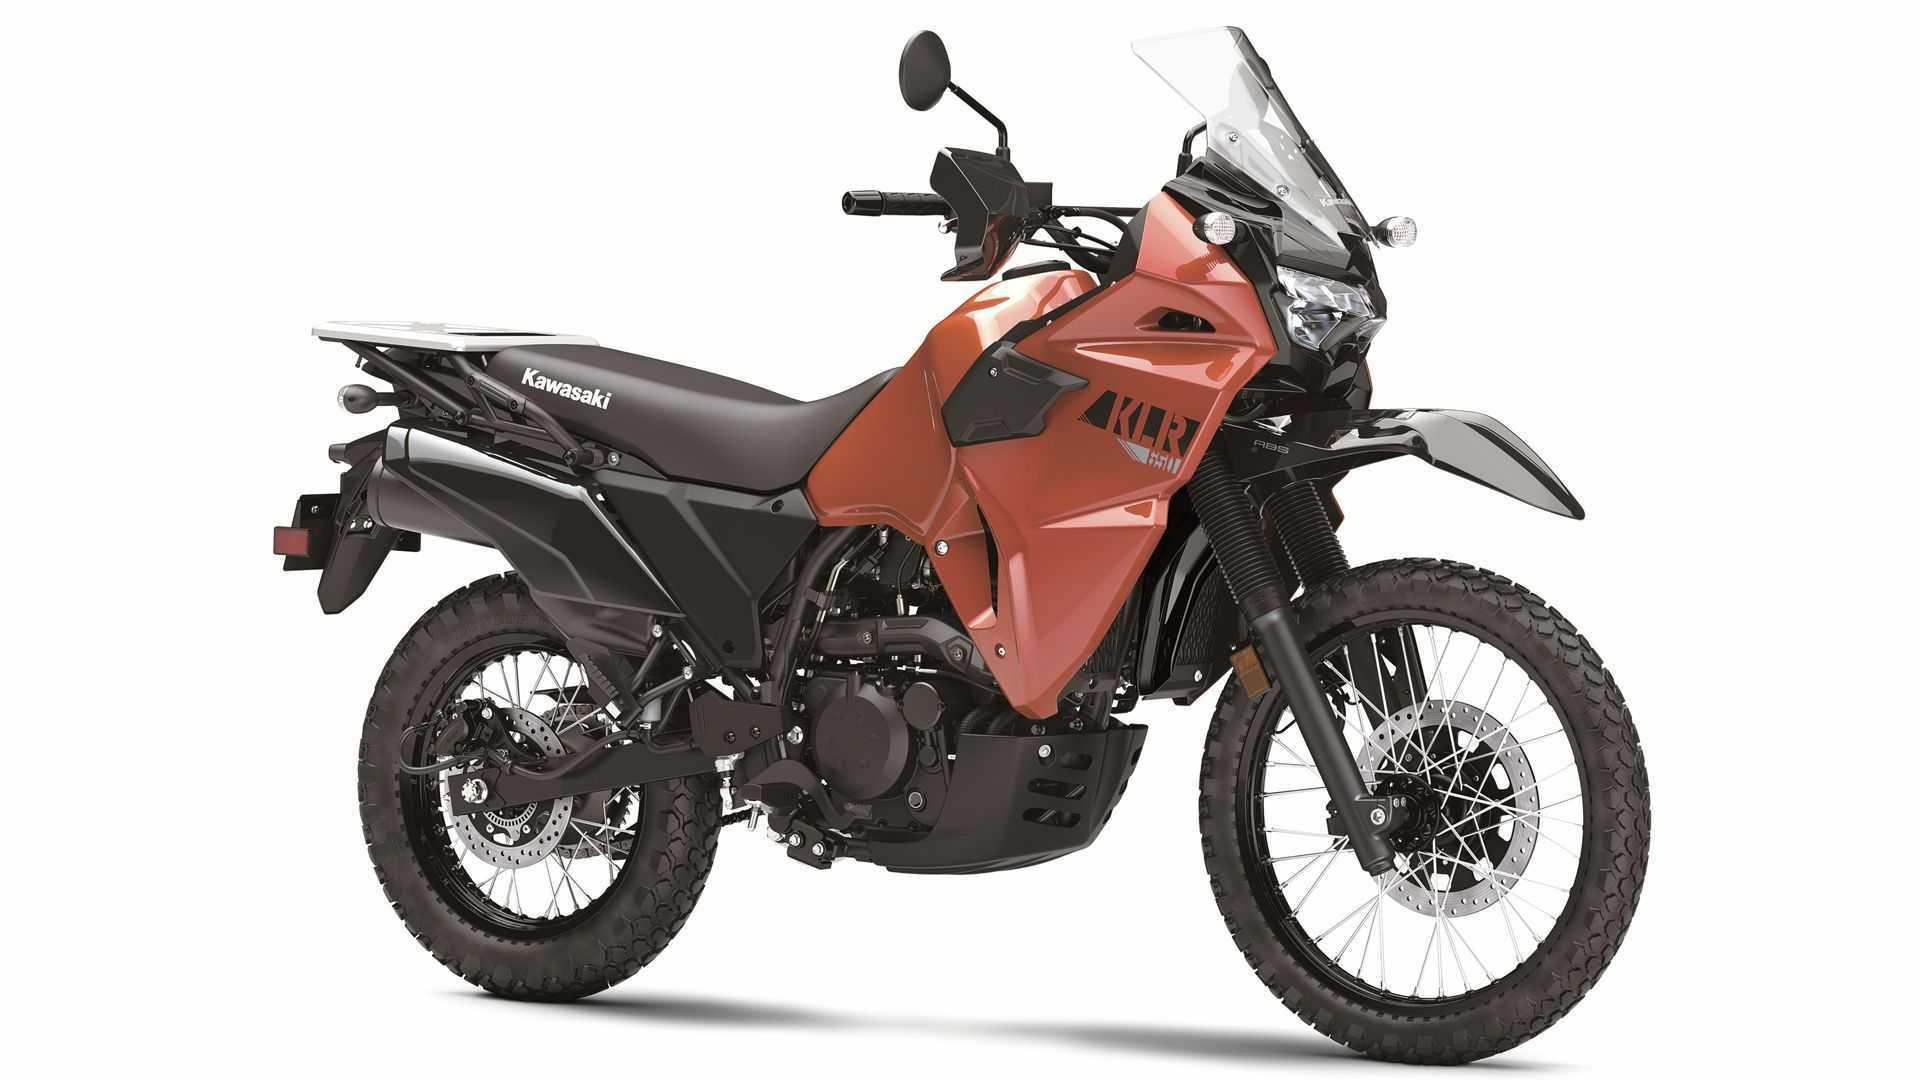 Long-Awaited Return: The Kawasaki KLR 650 Is Back!